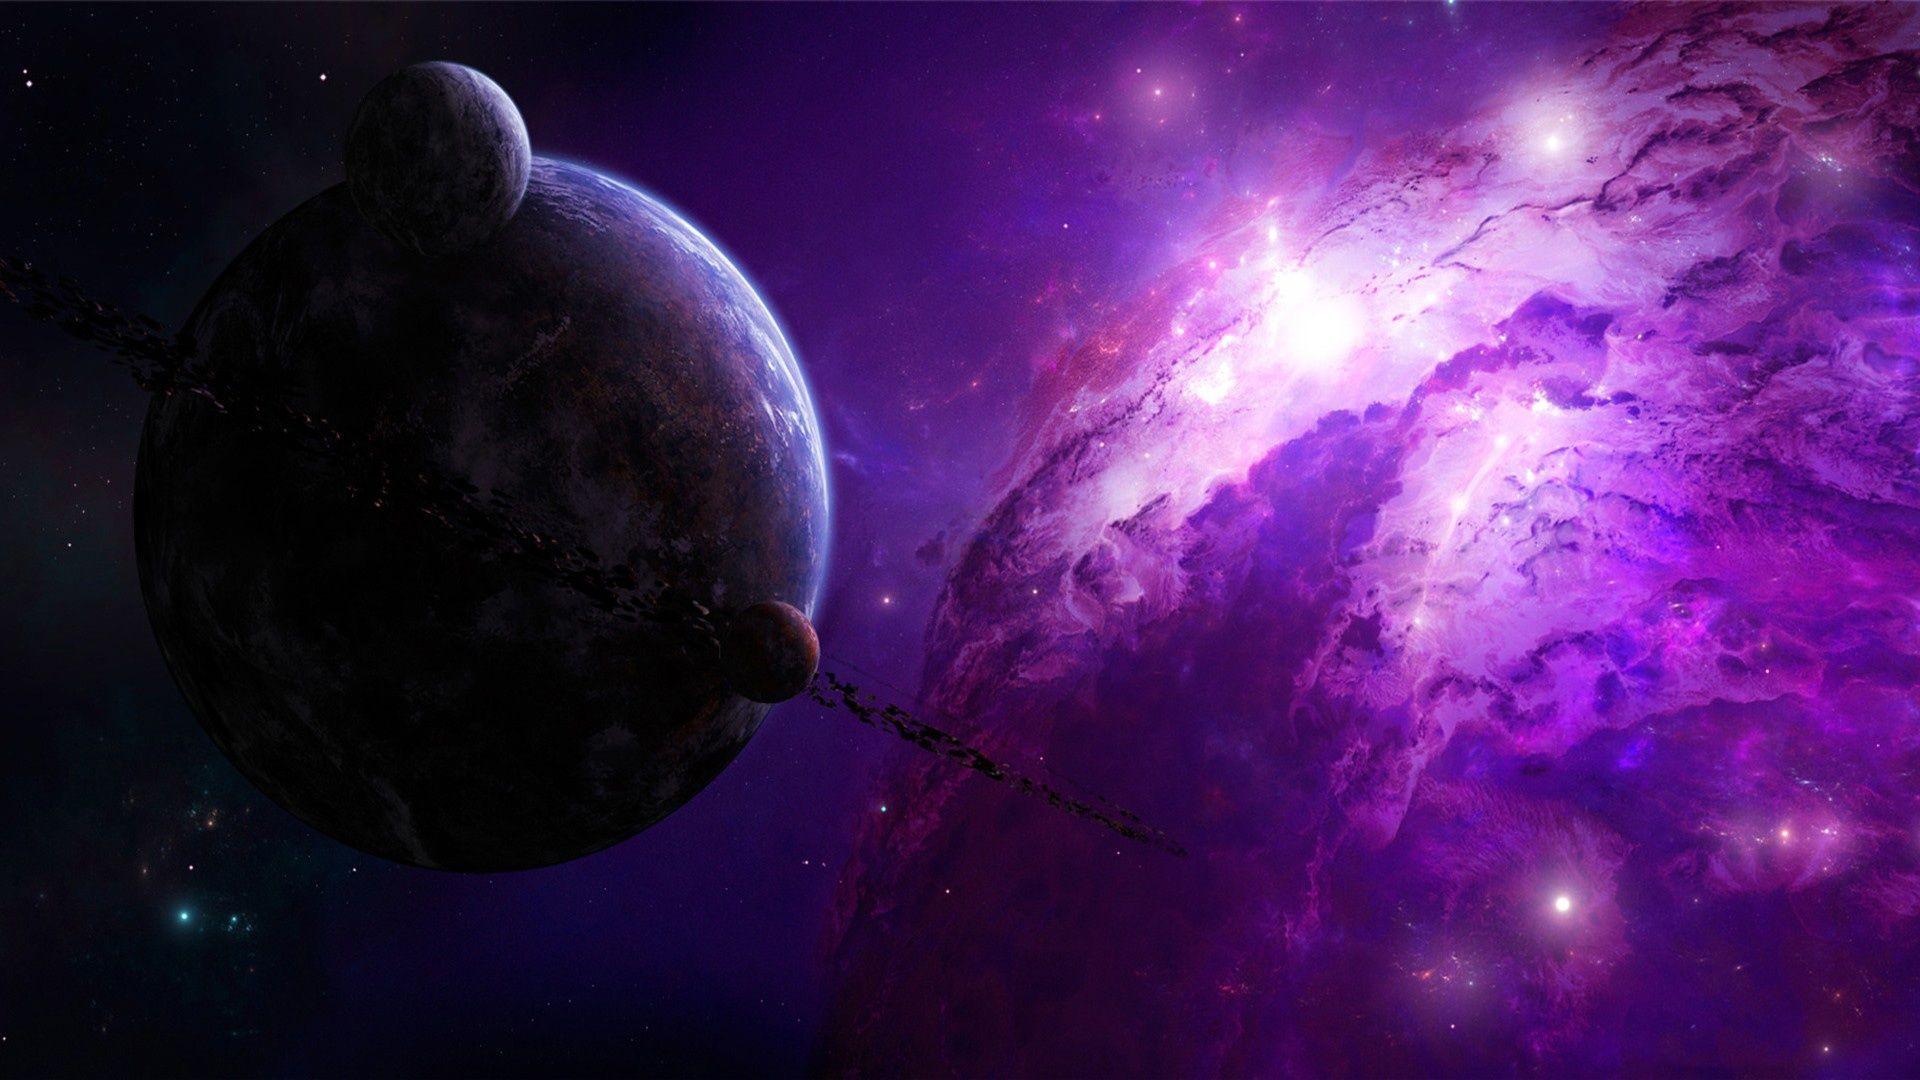 Hd wallpaper galaxy - Galaxy Wallpaper 1080p Wallpapersafari